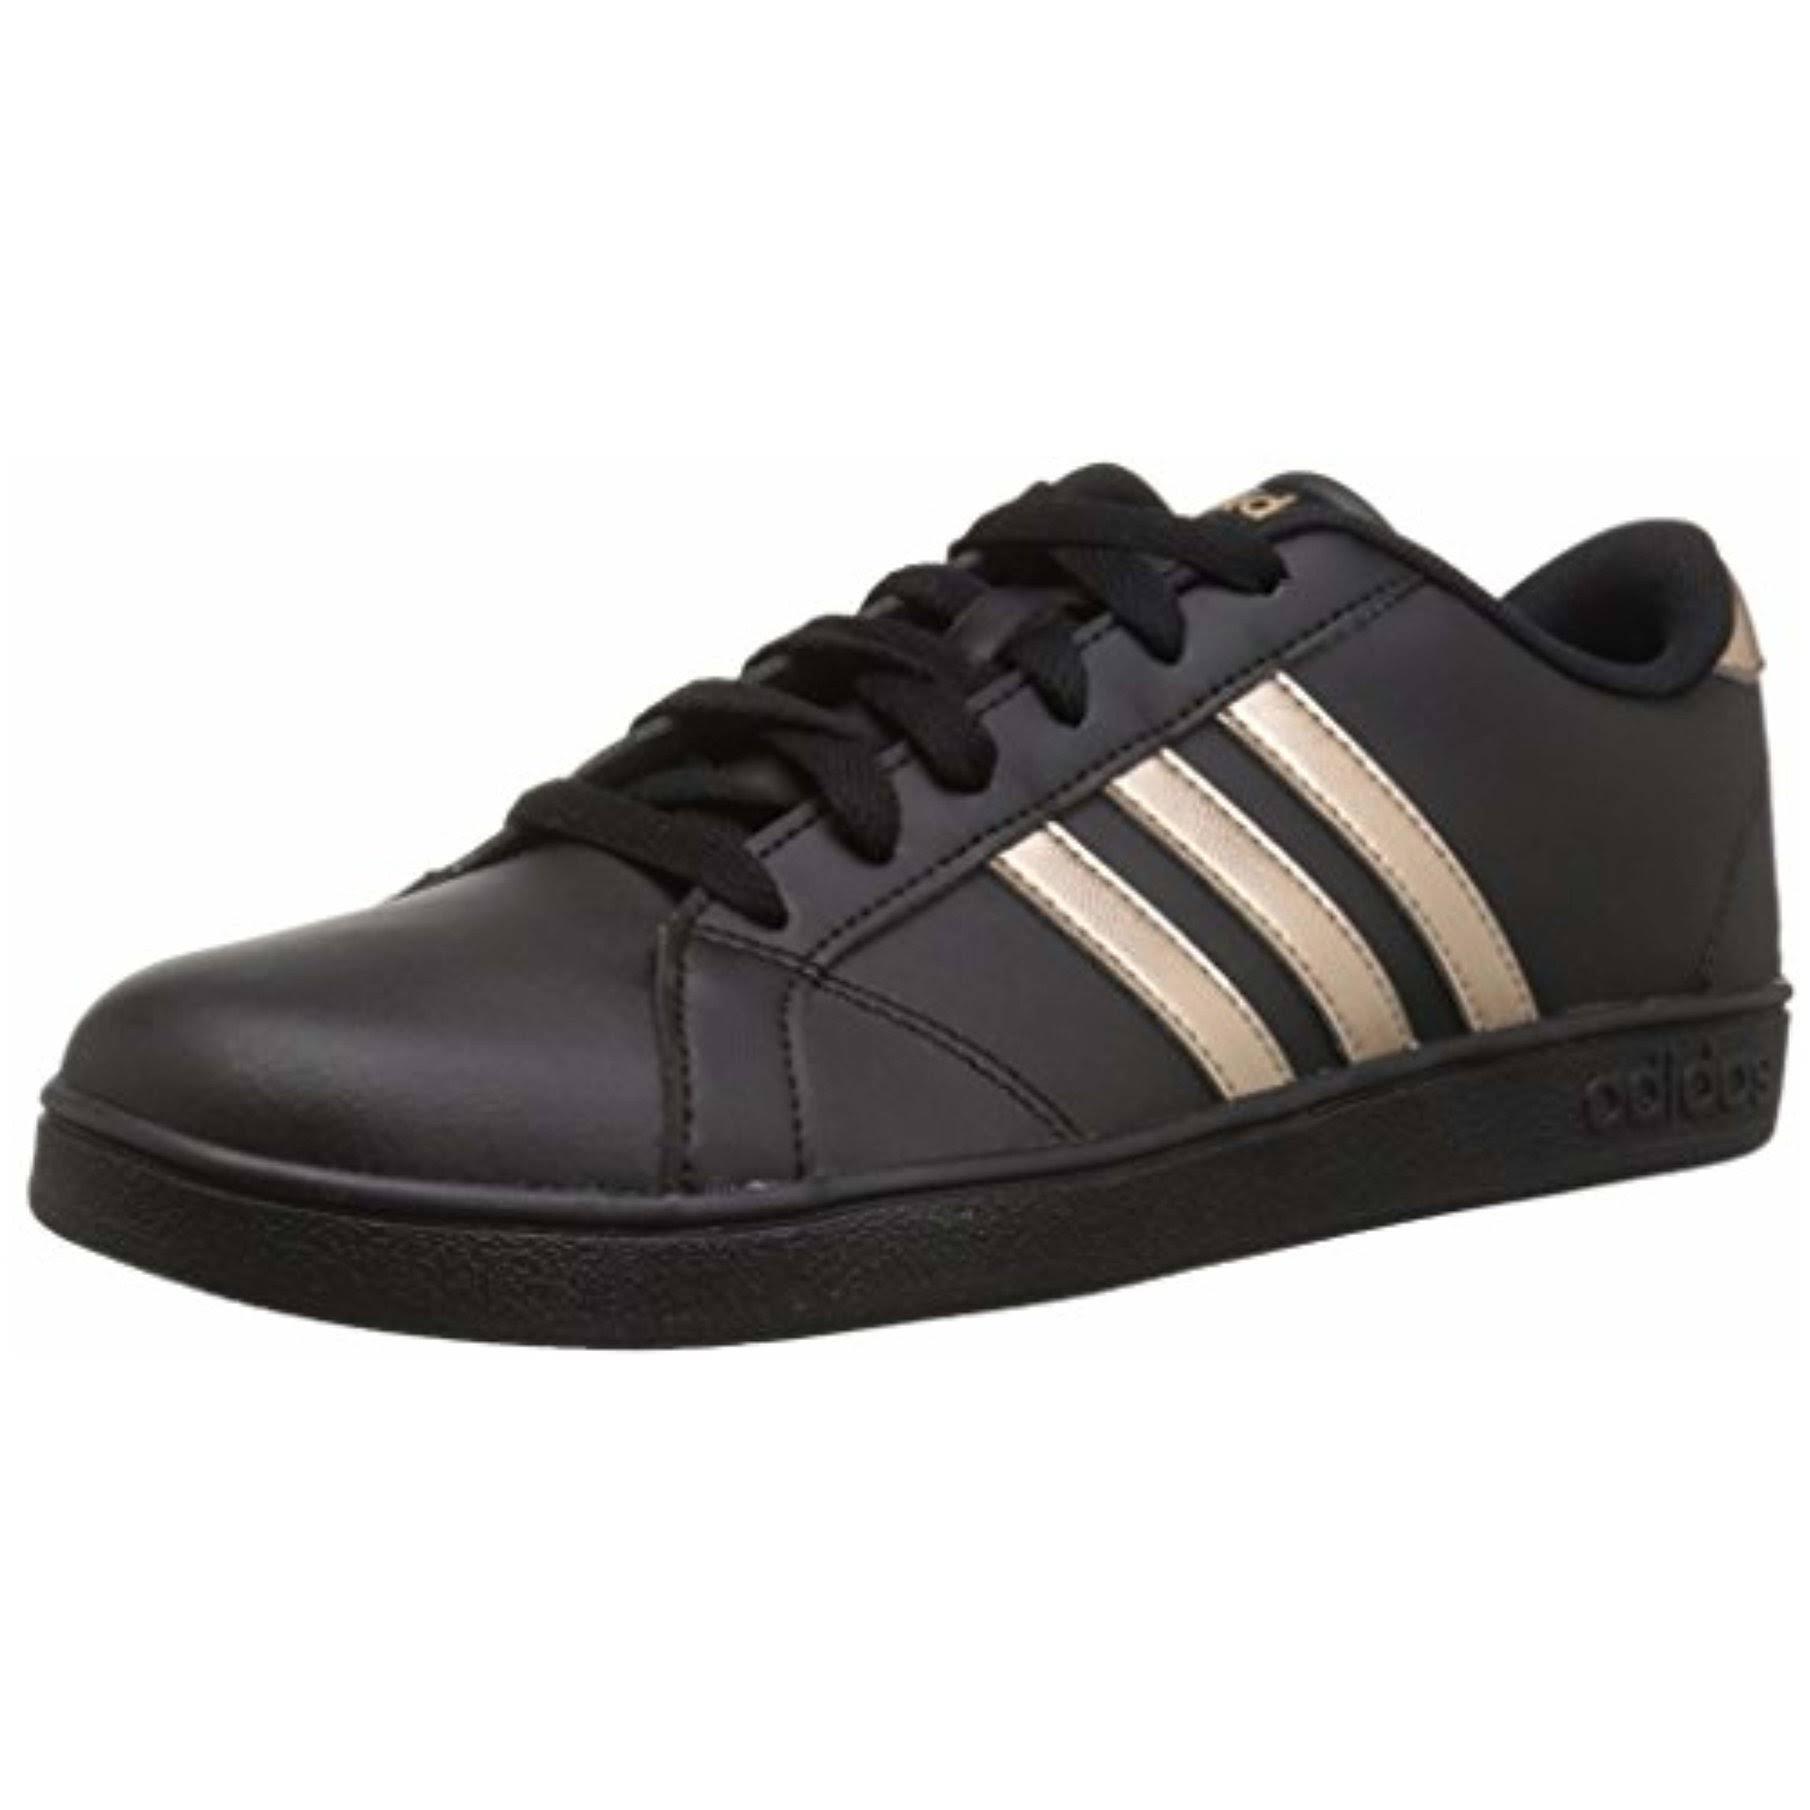 Baseline copper Shoes Black Originals Youth Adidas 1 5x6wOnBFW